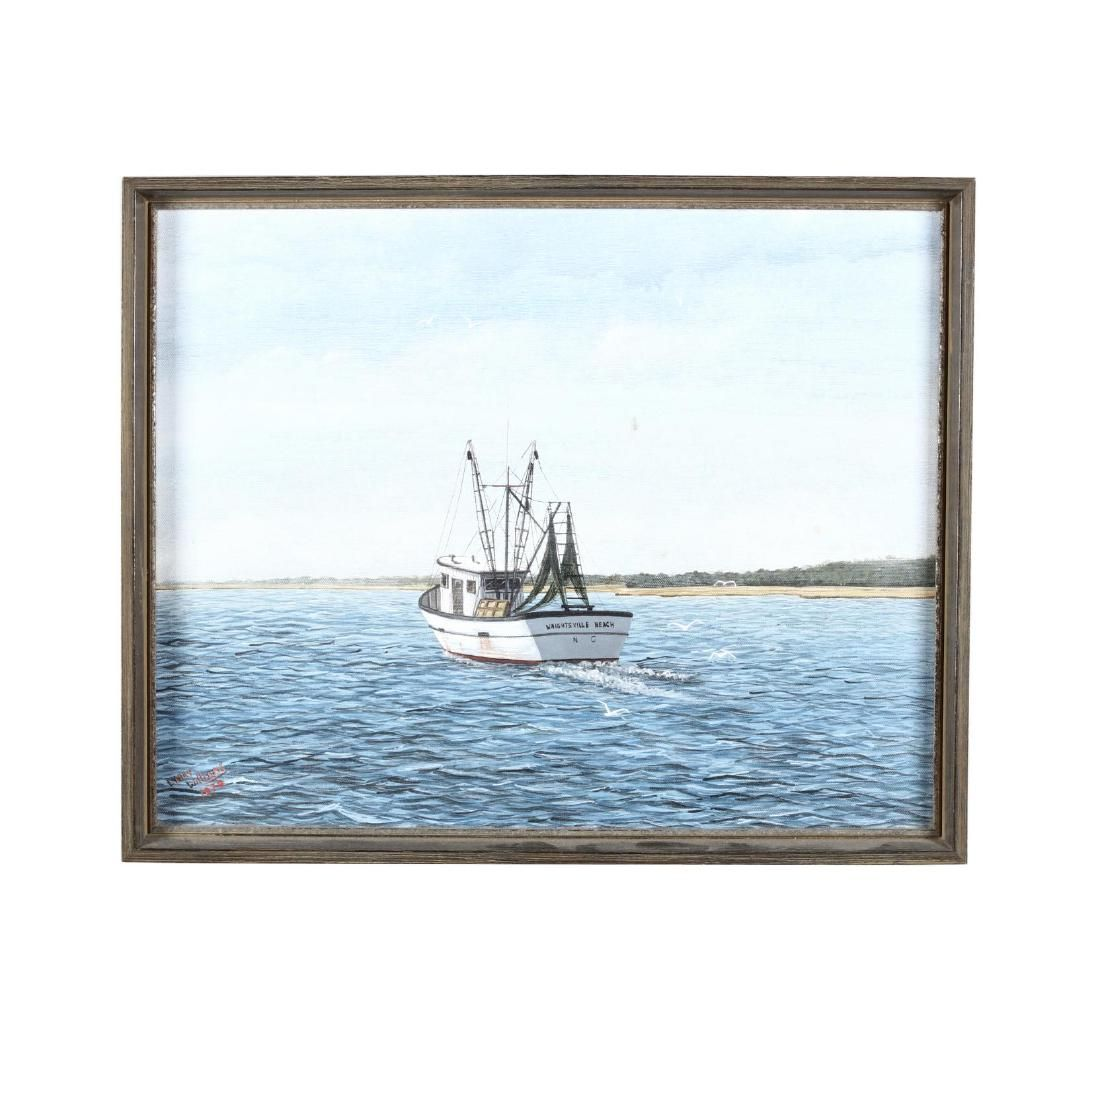 Larry Williams (NC), Fishing Boat, Wrightsville Beach